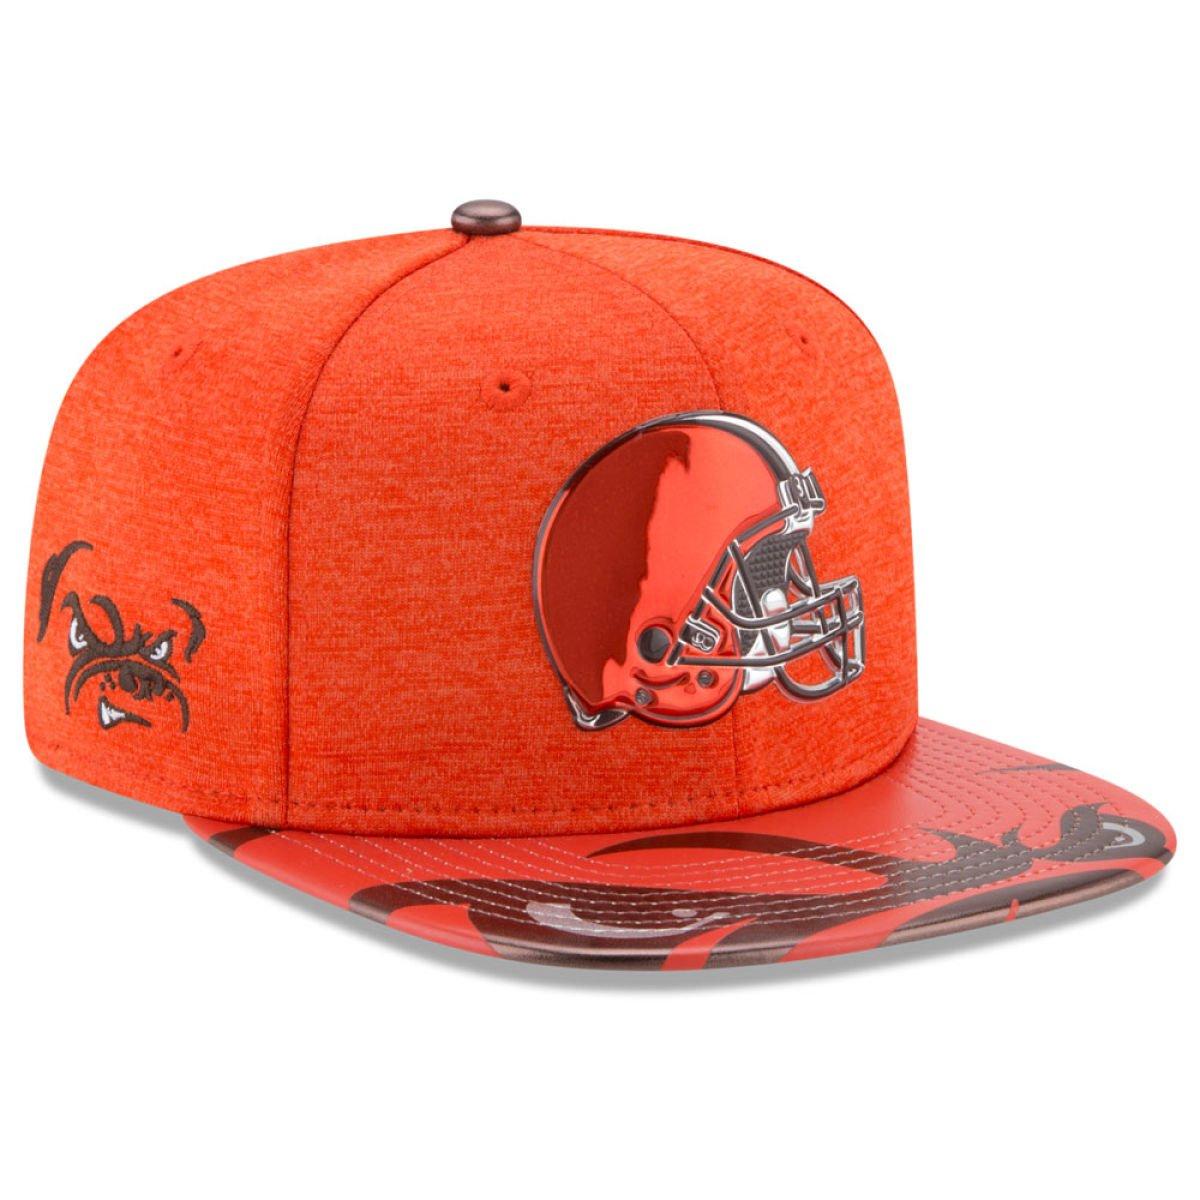 New Era Snapback Cap - NFL 2017 DRAFT Cleveland Browns ...